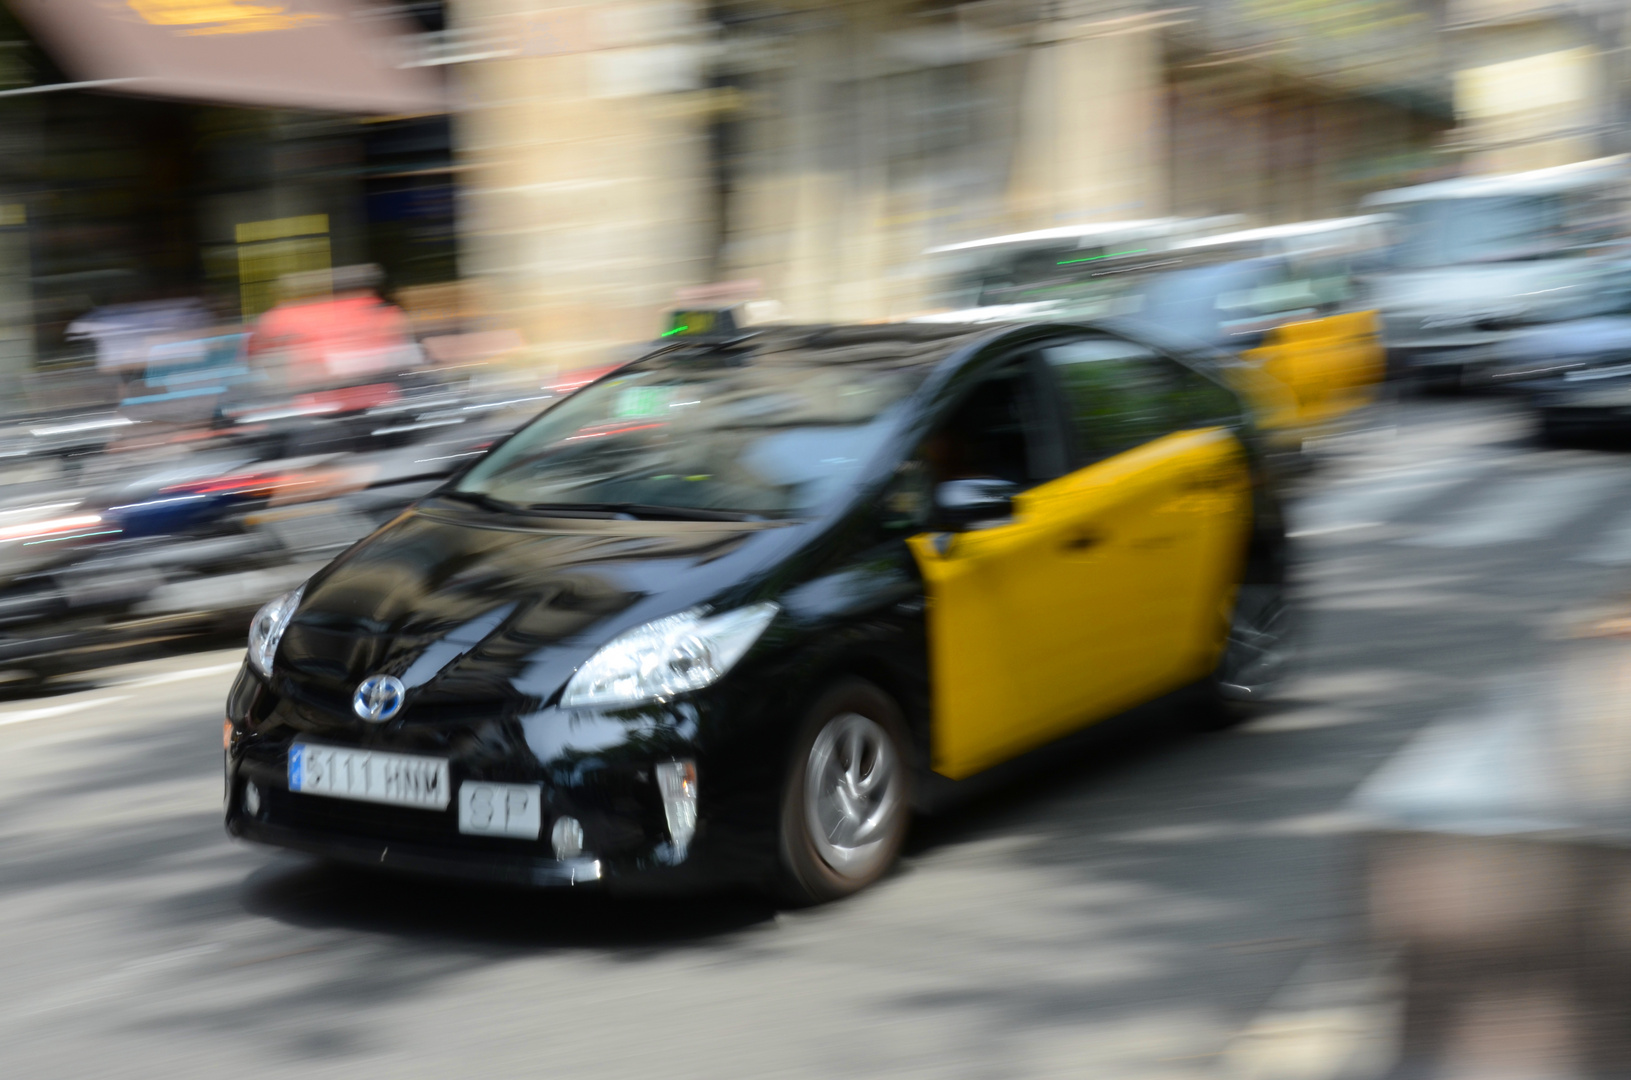 Speeeeeeddddd - Rush Hour in Barcelona